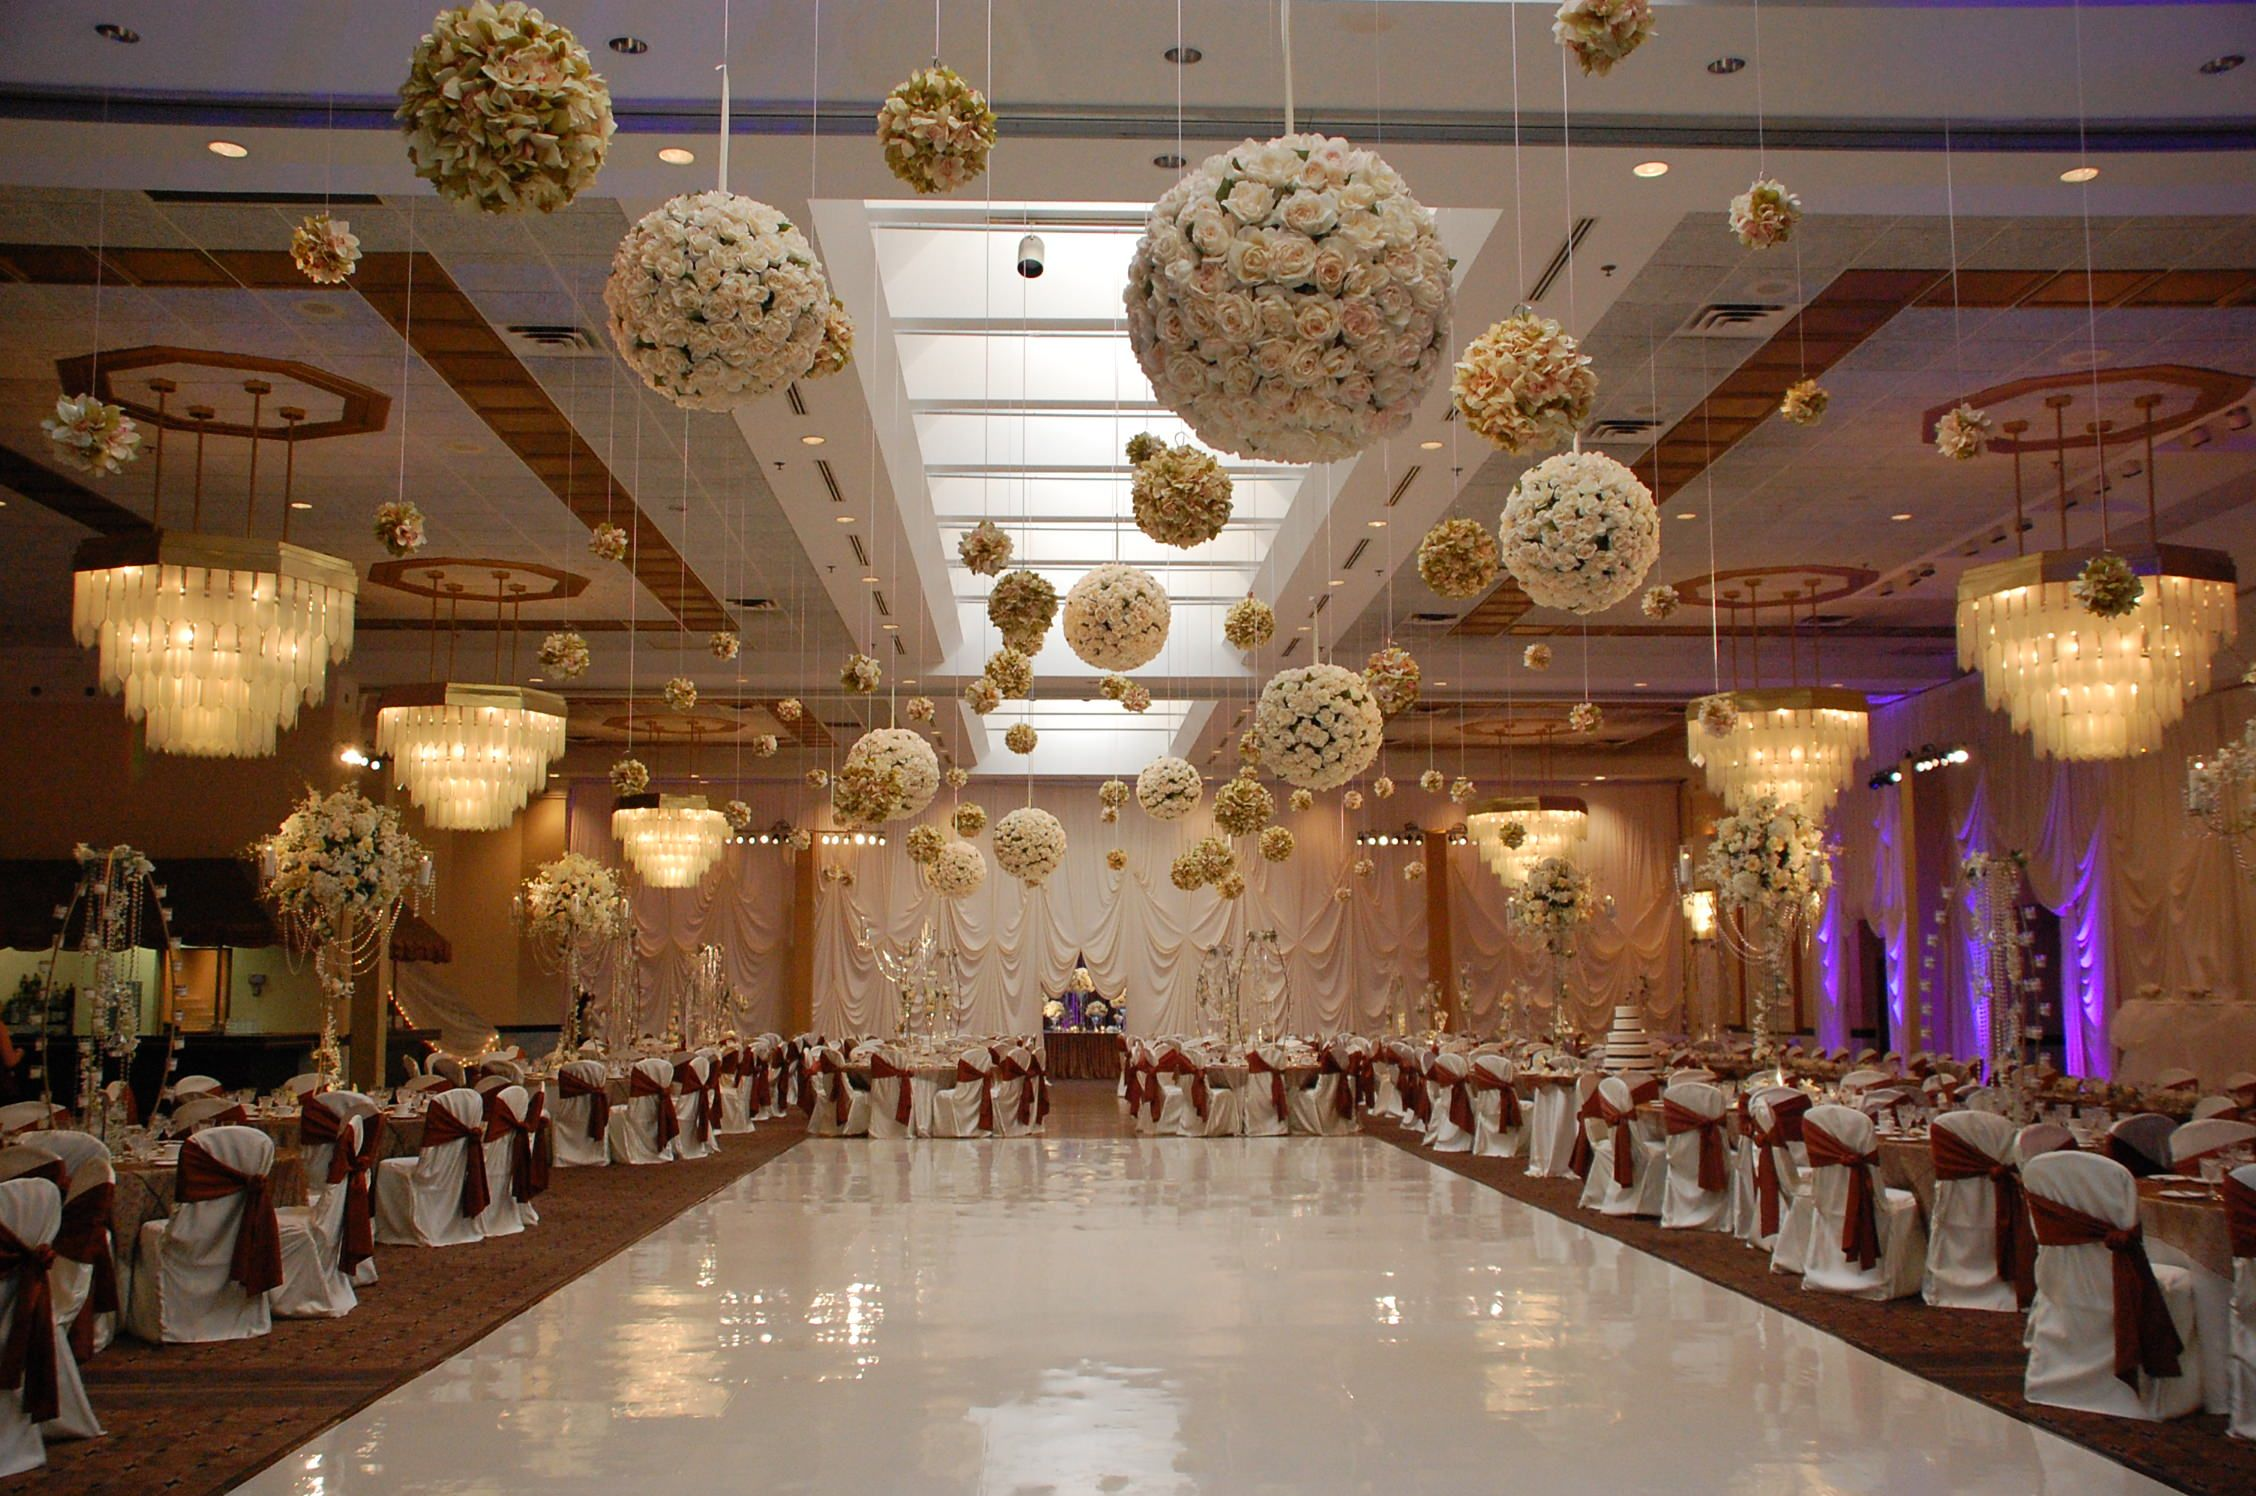 12 Best Hanging Decoration Ideas For Wedding Event Ceilings 12 Best Hanging Decoration  Ideas For Wedding